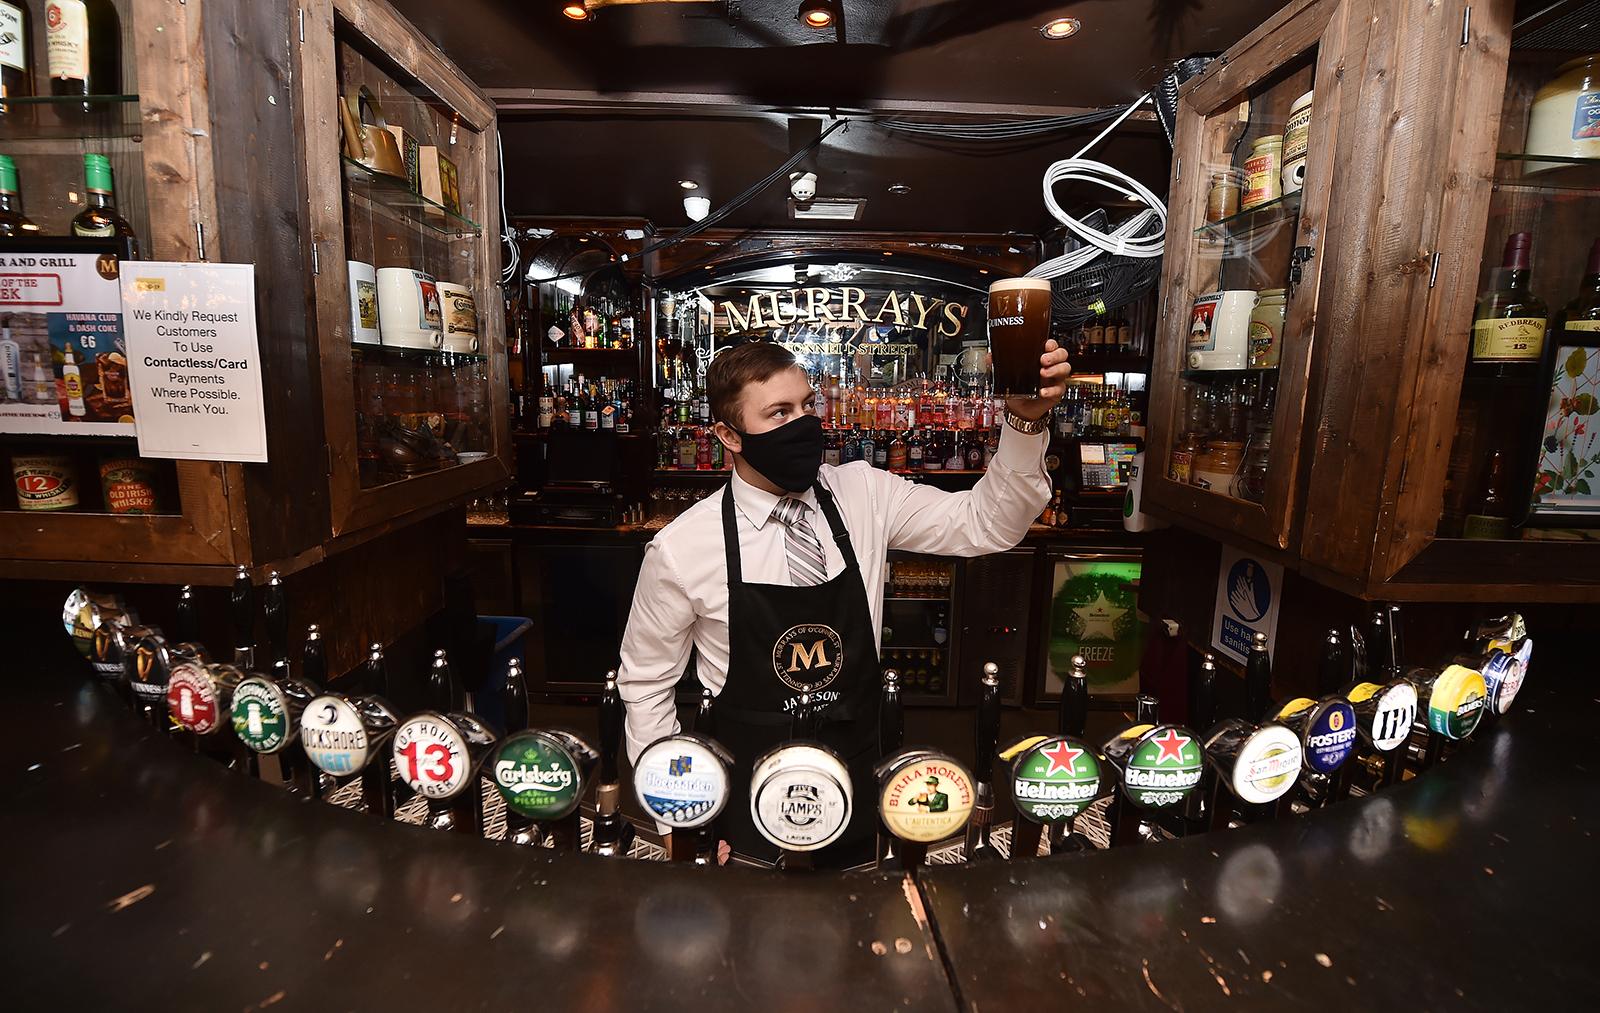 A barman in Murrays pub on Grafton street checks the head on a pint of Guinness on June 29 in Dublin, Ireland.